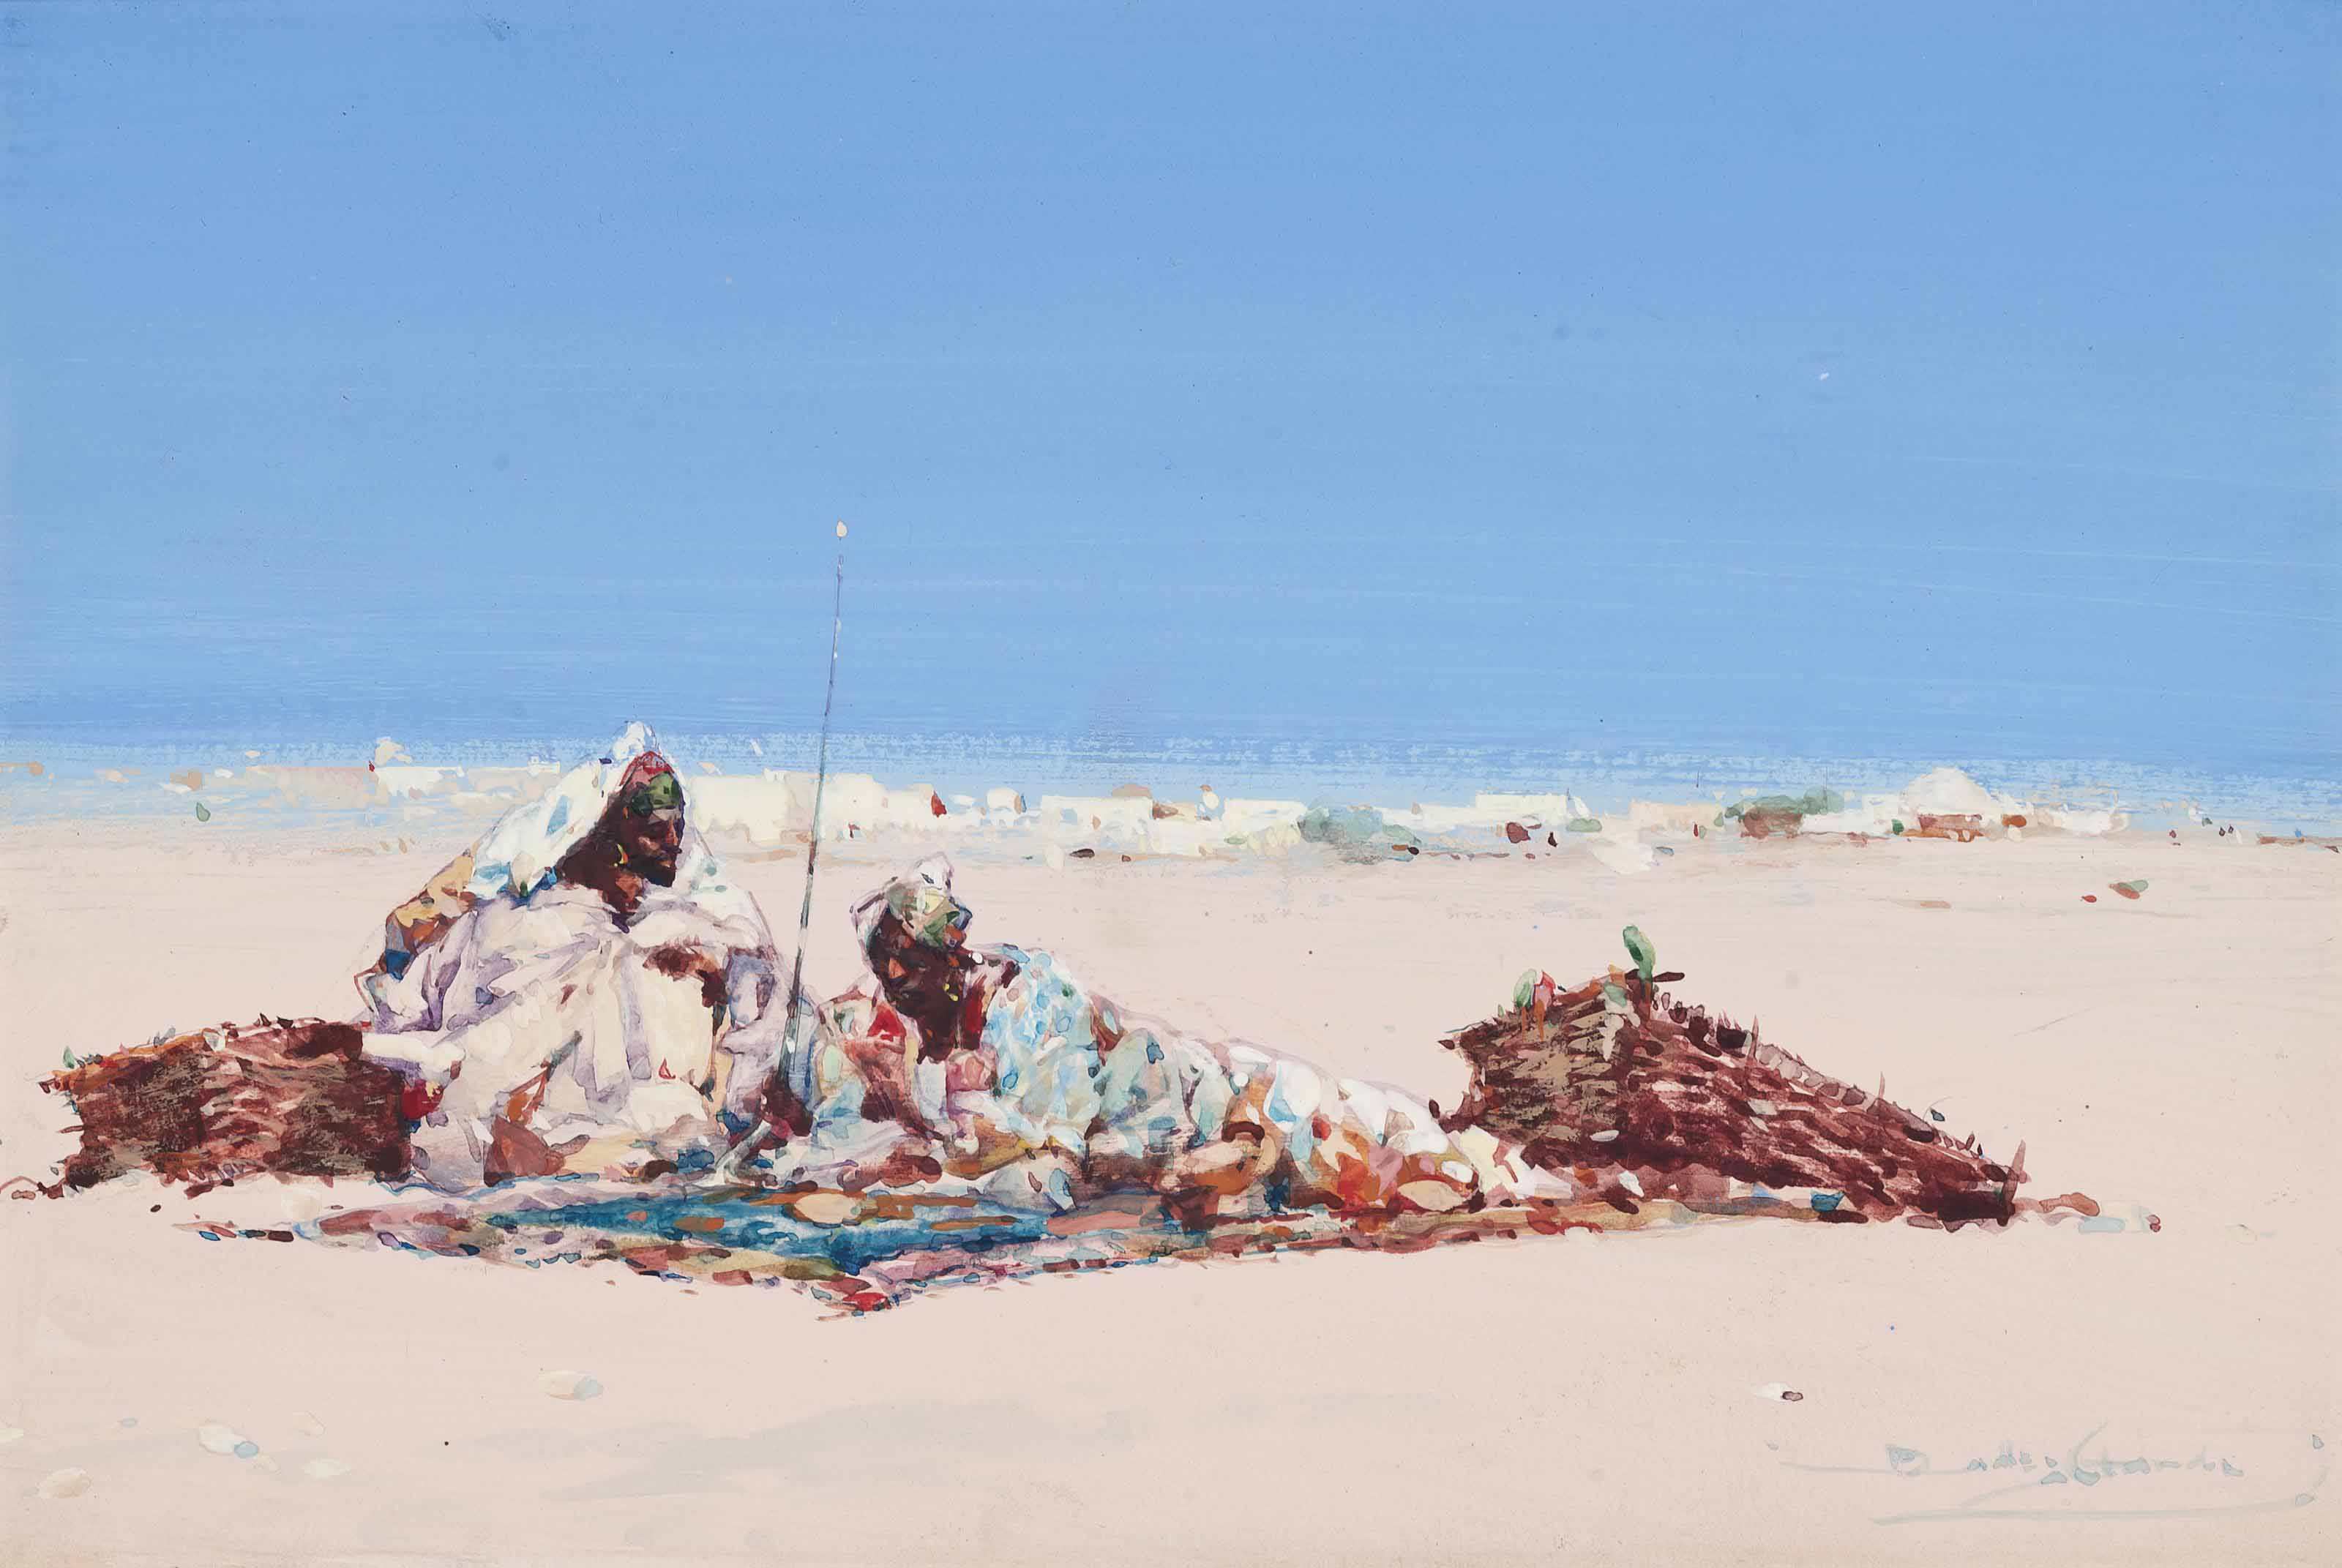 Traders in the desert